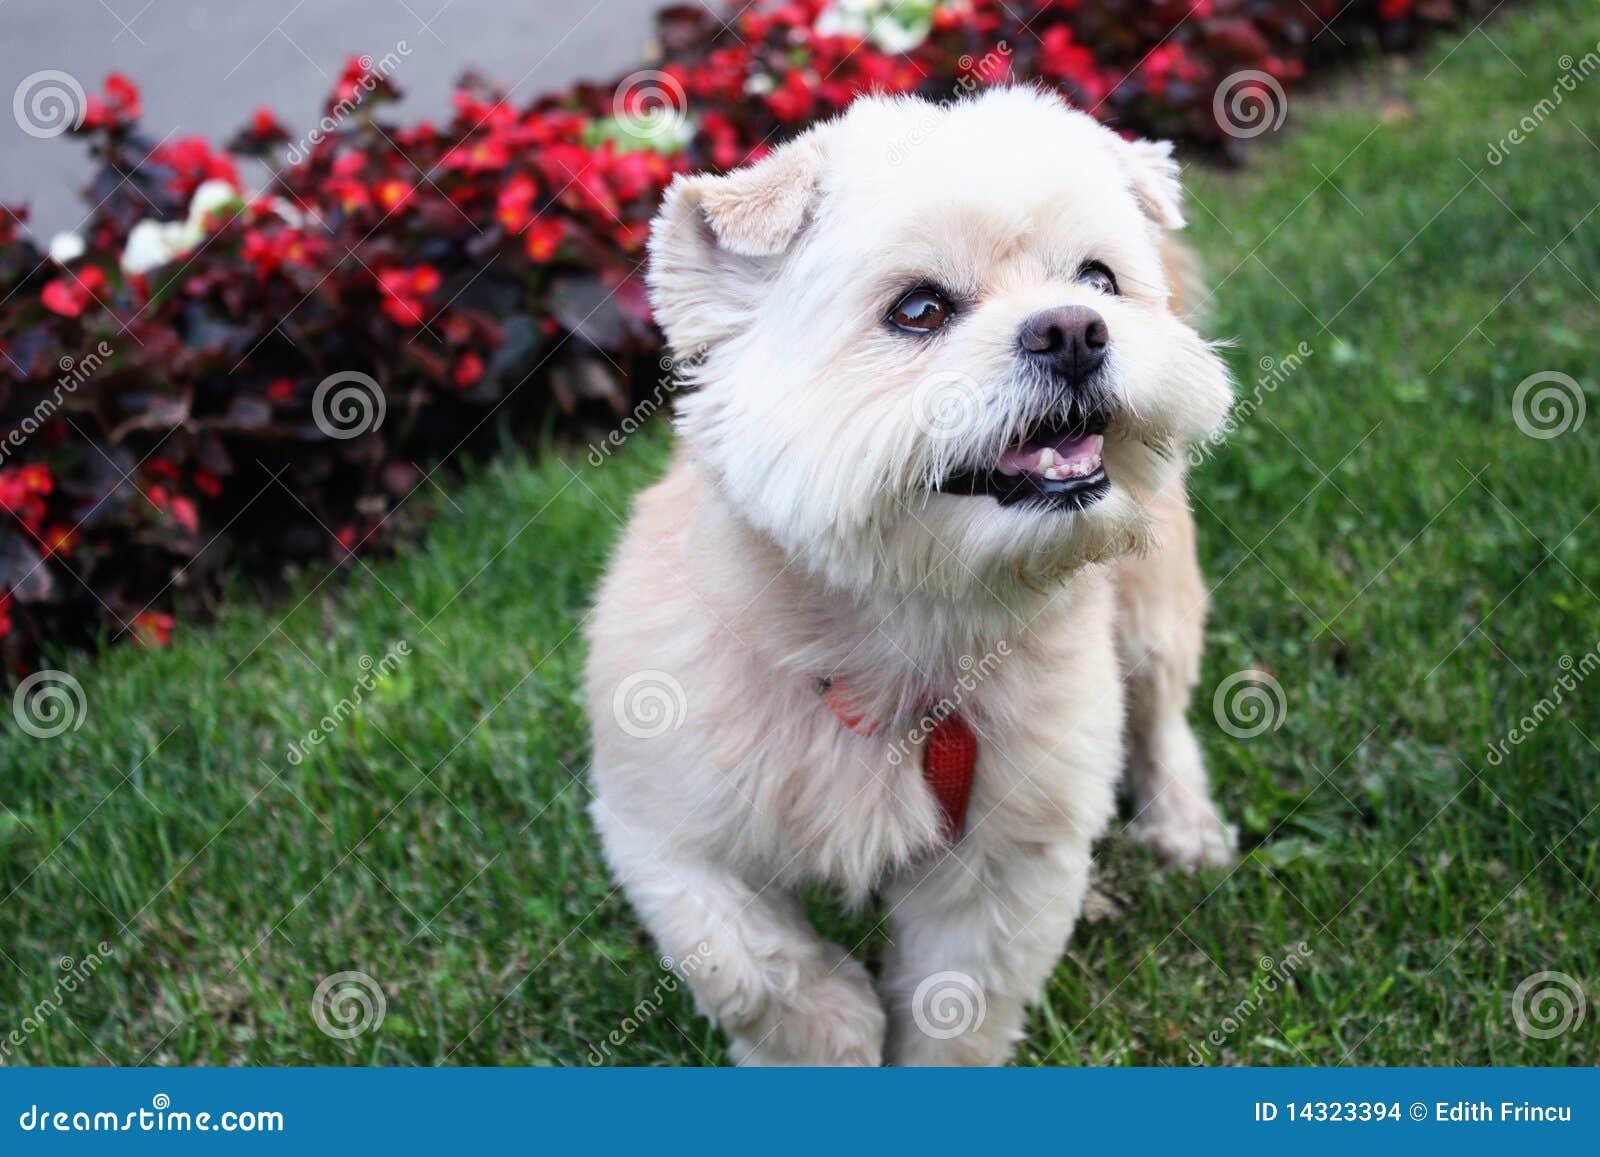 Cute White Dog Stock Images - Image: 14323394